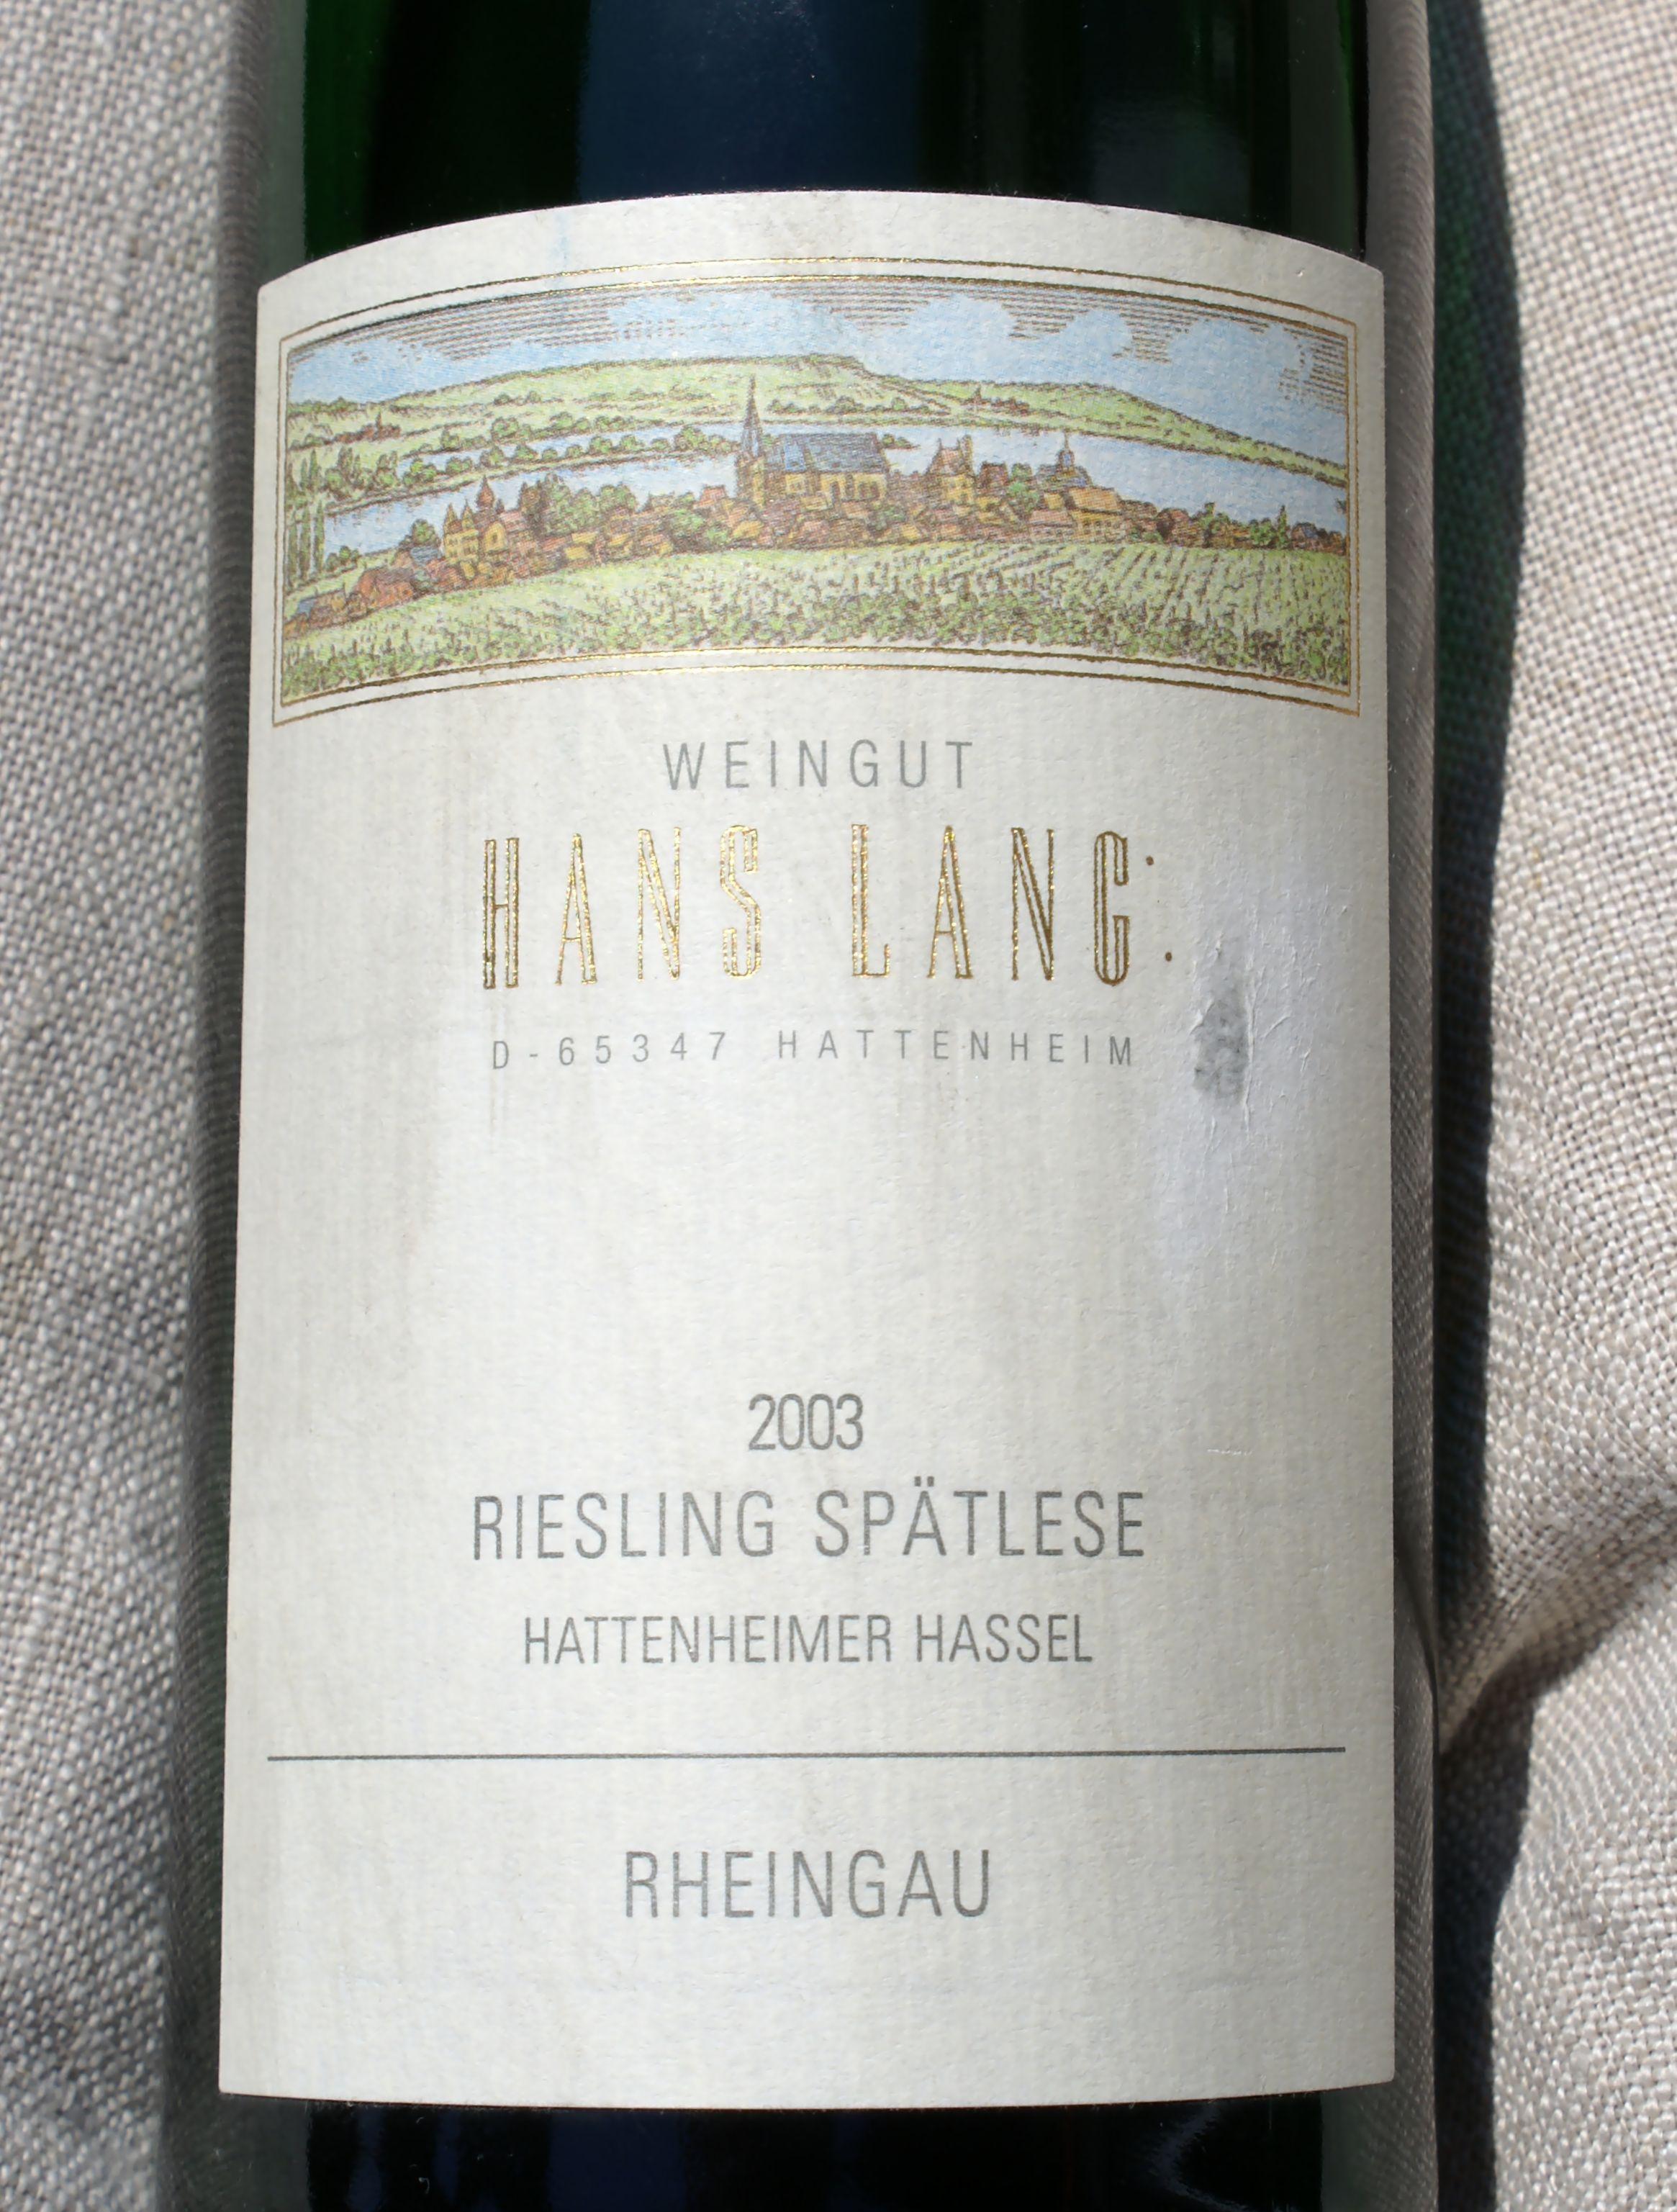 Hans Lang Riesling Hassel Spatlese 2003 (1)